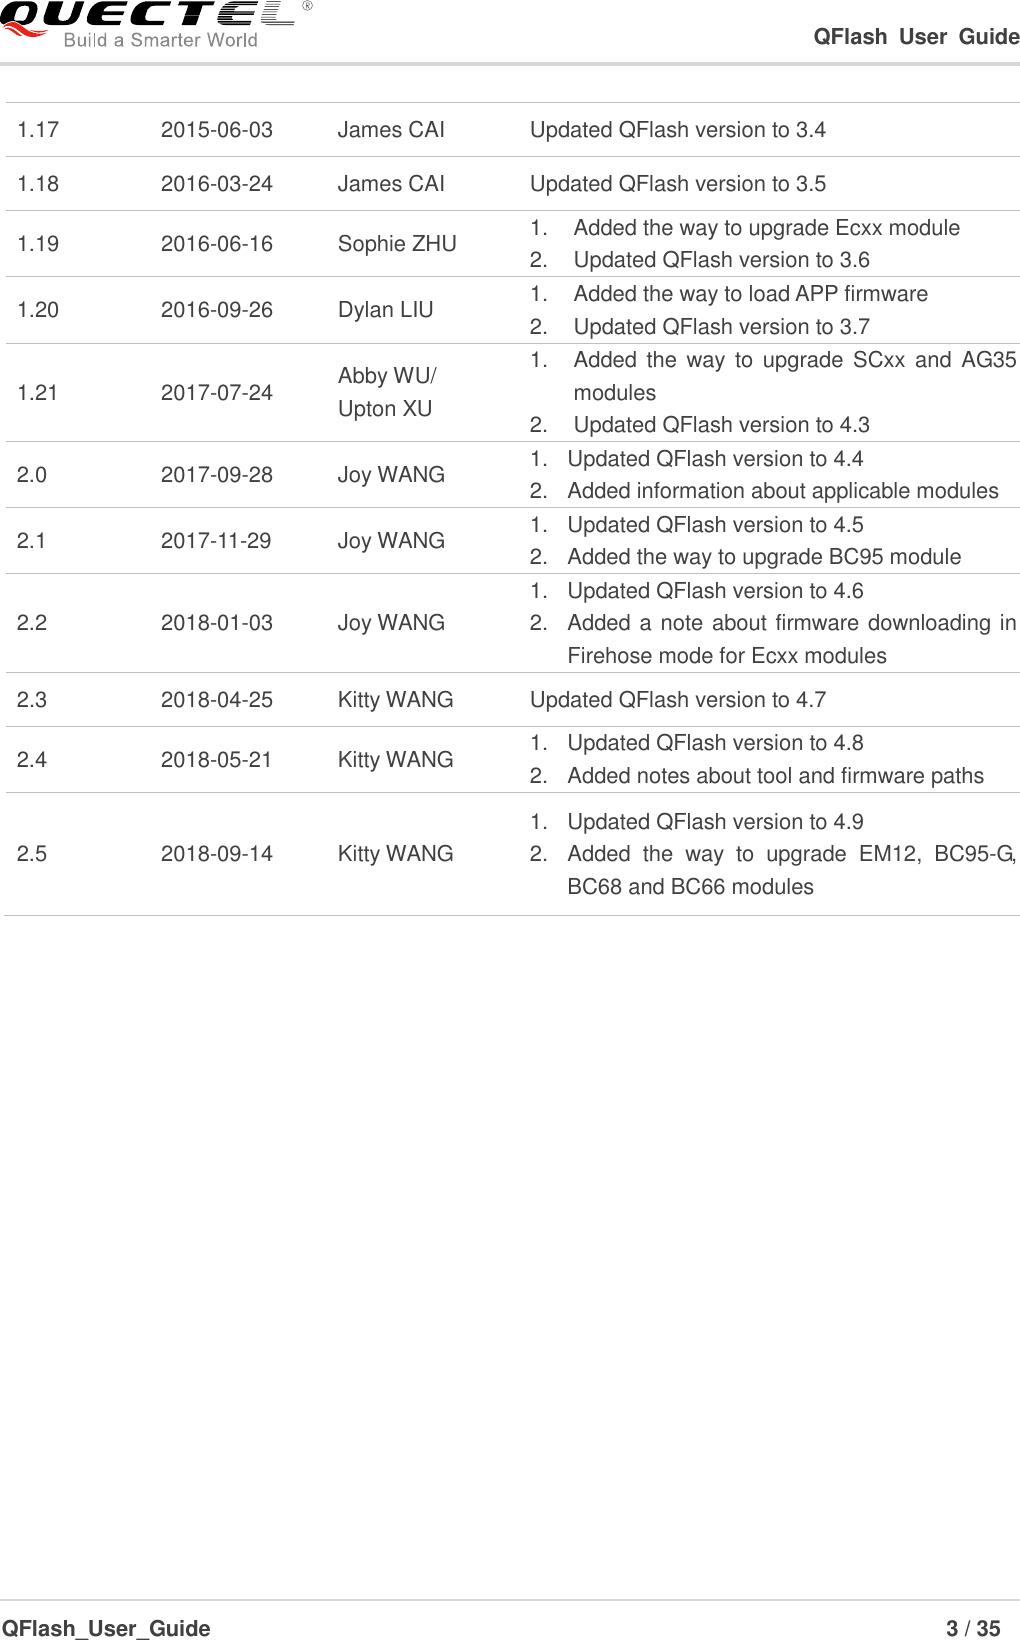 Quectel QFlash User Guide V2 5